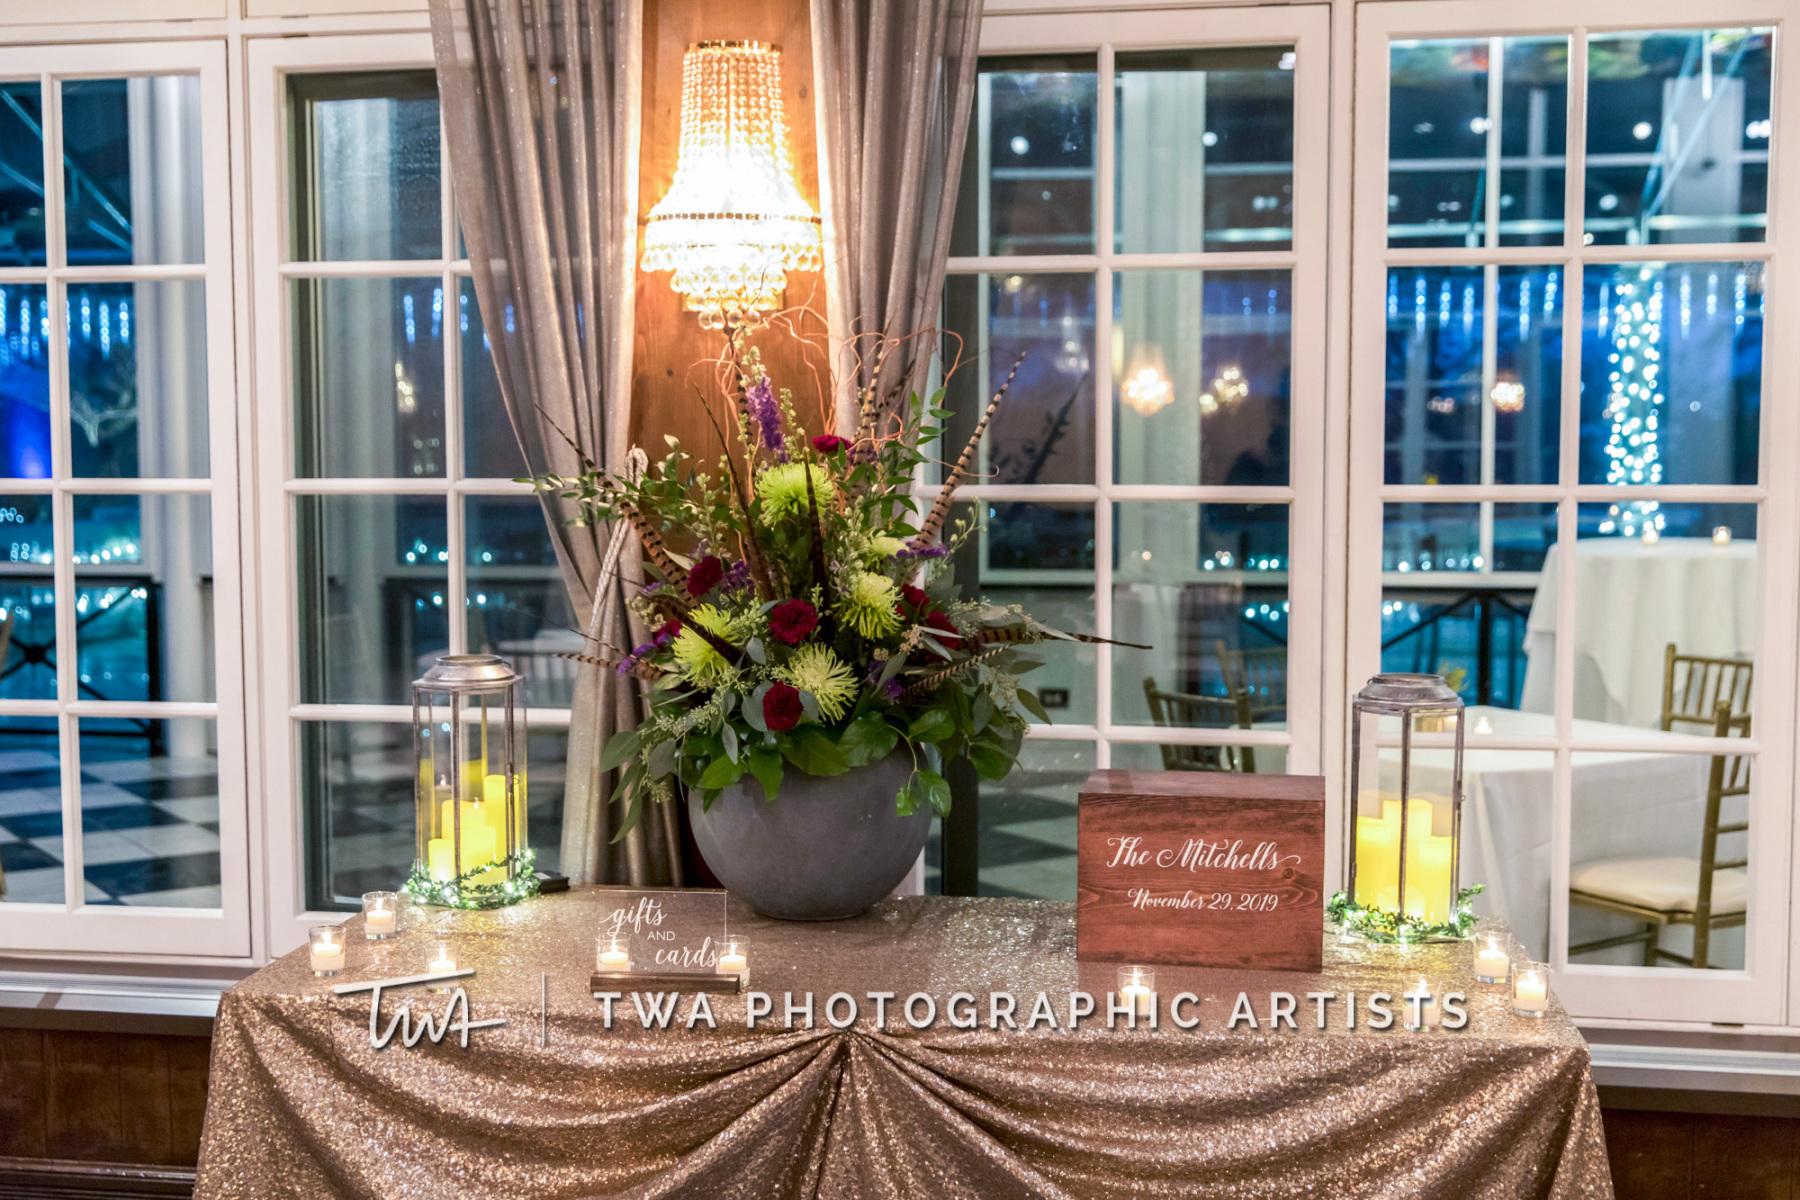 Chicago-Wedding-Photographer-TWA-Photographic-Artists-Drake-Hotel_Meyer_Mitchell_MC_DR-1253